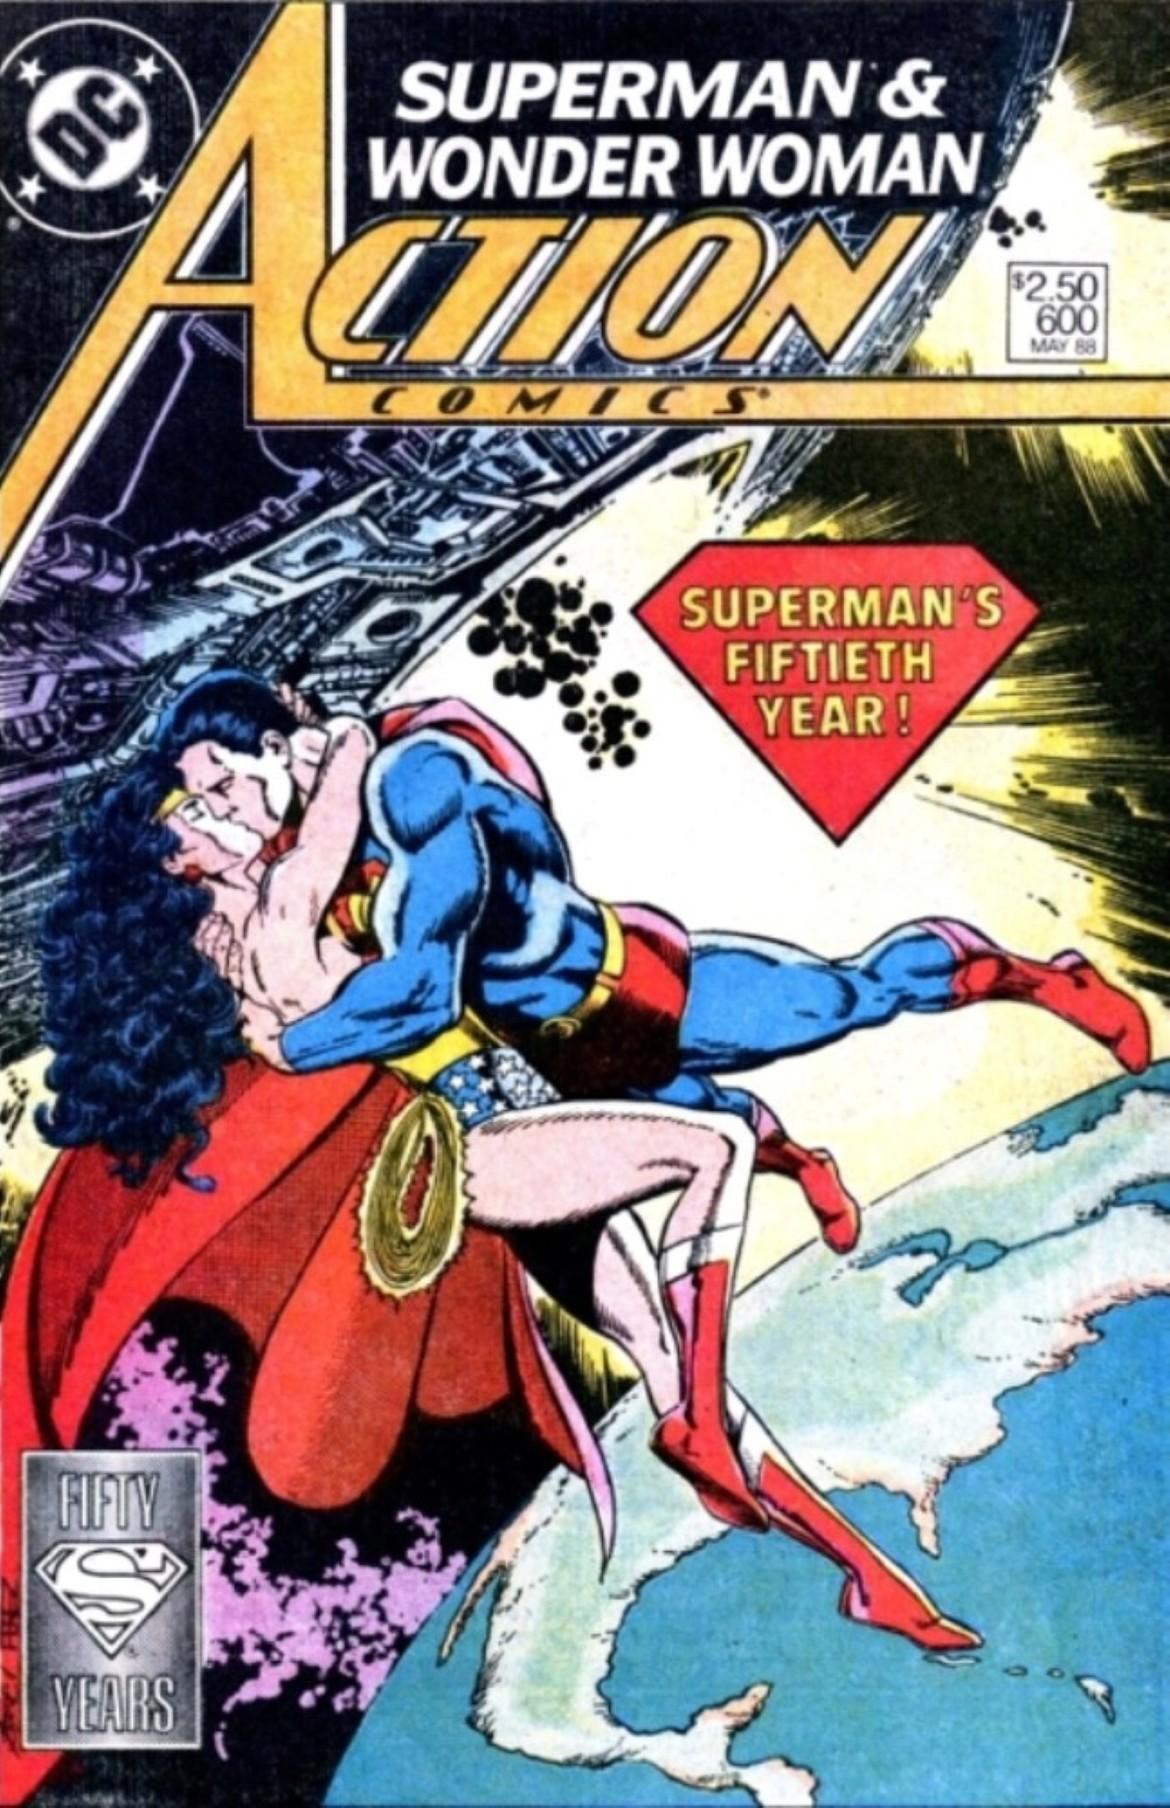 Action Comics 600 (Custom).jpg